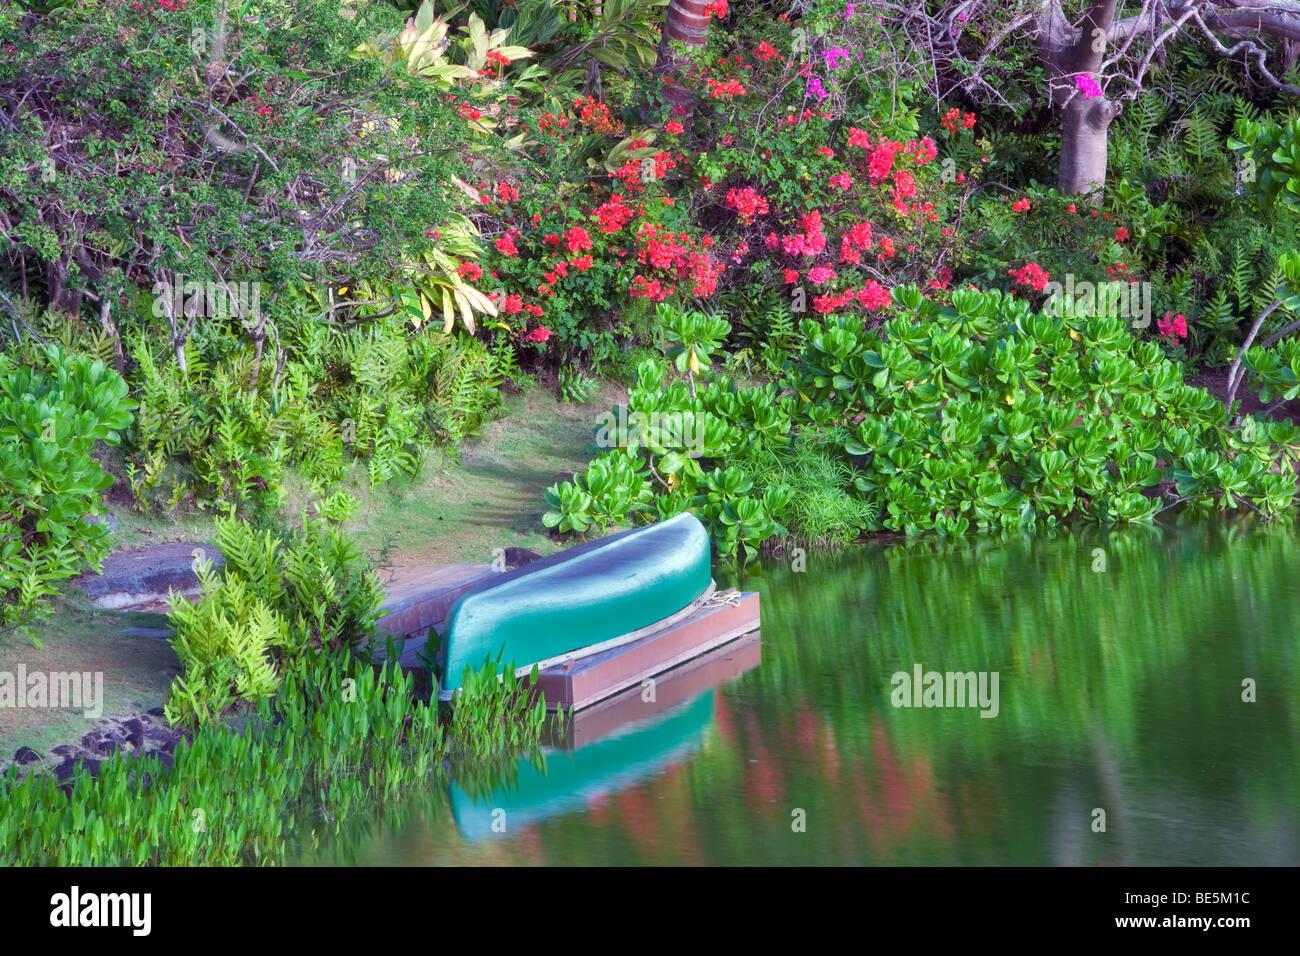 Pond with canoe and garden at Na Aina Kai Botanical Gardens. Kauai, Hawaii - Stock Image